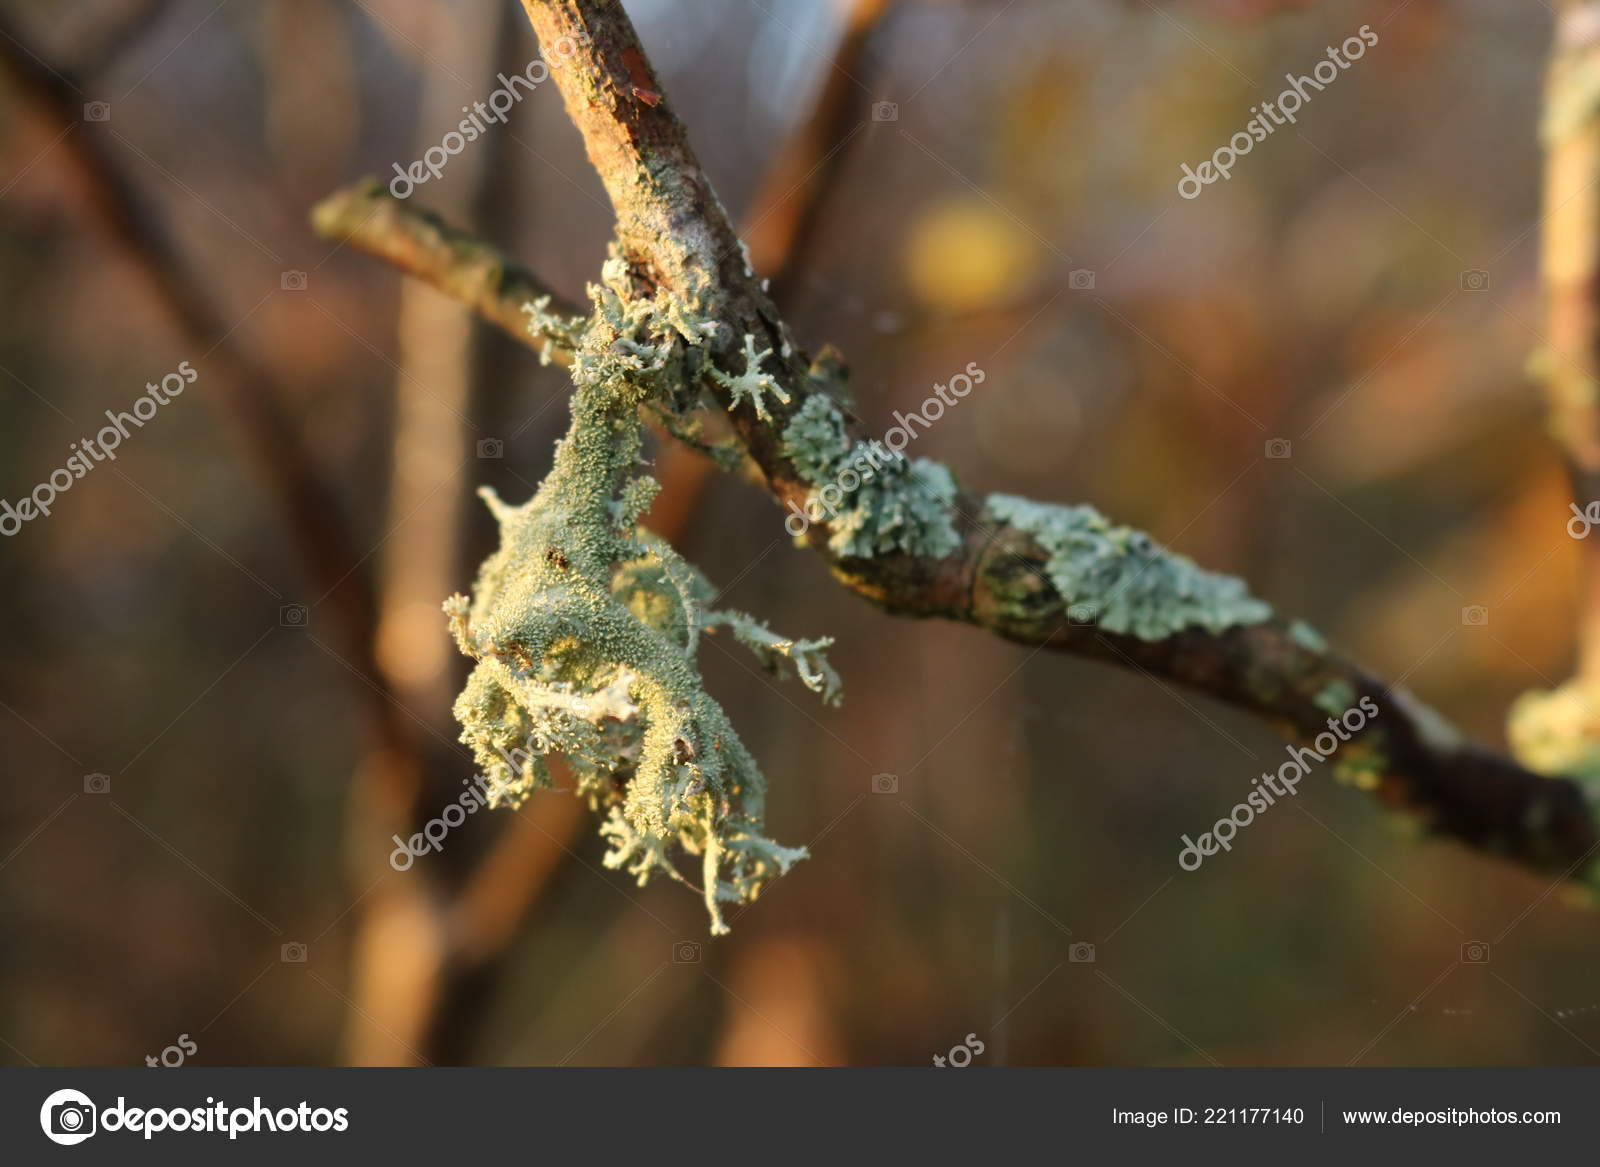 malignant ductal papilloma